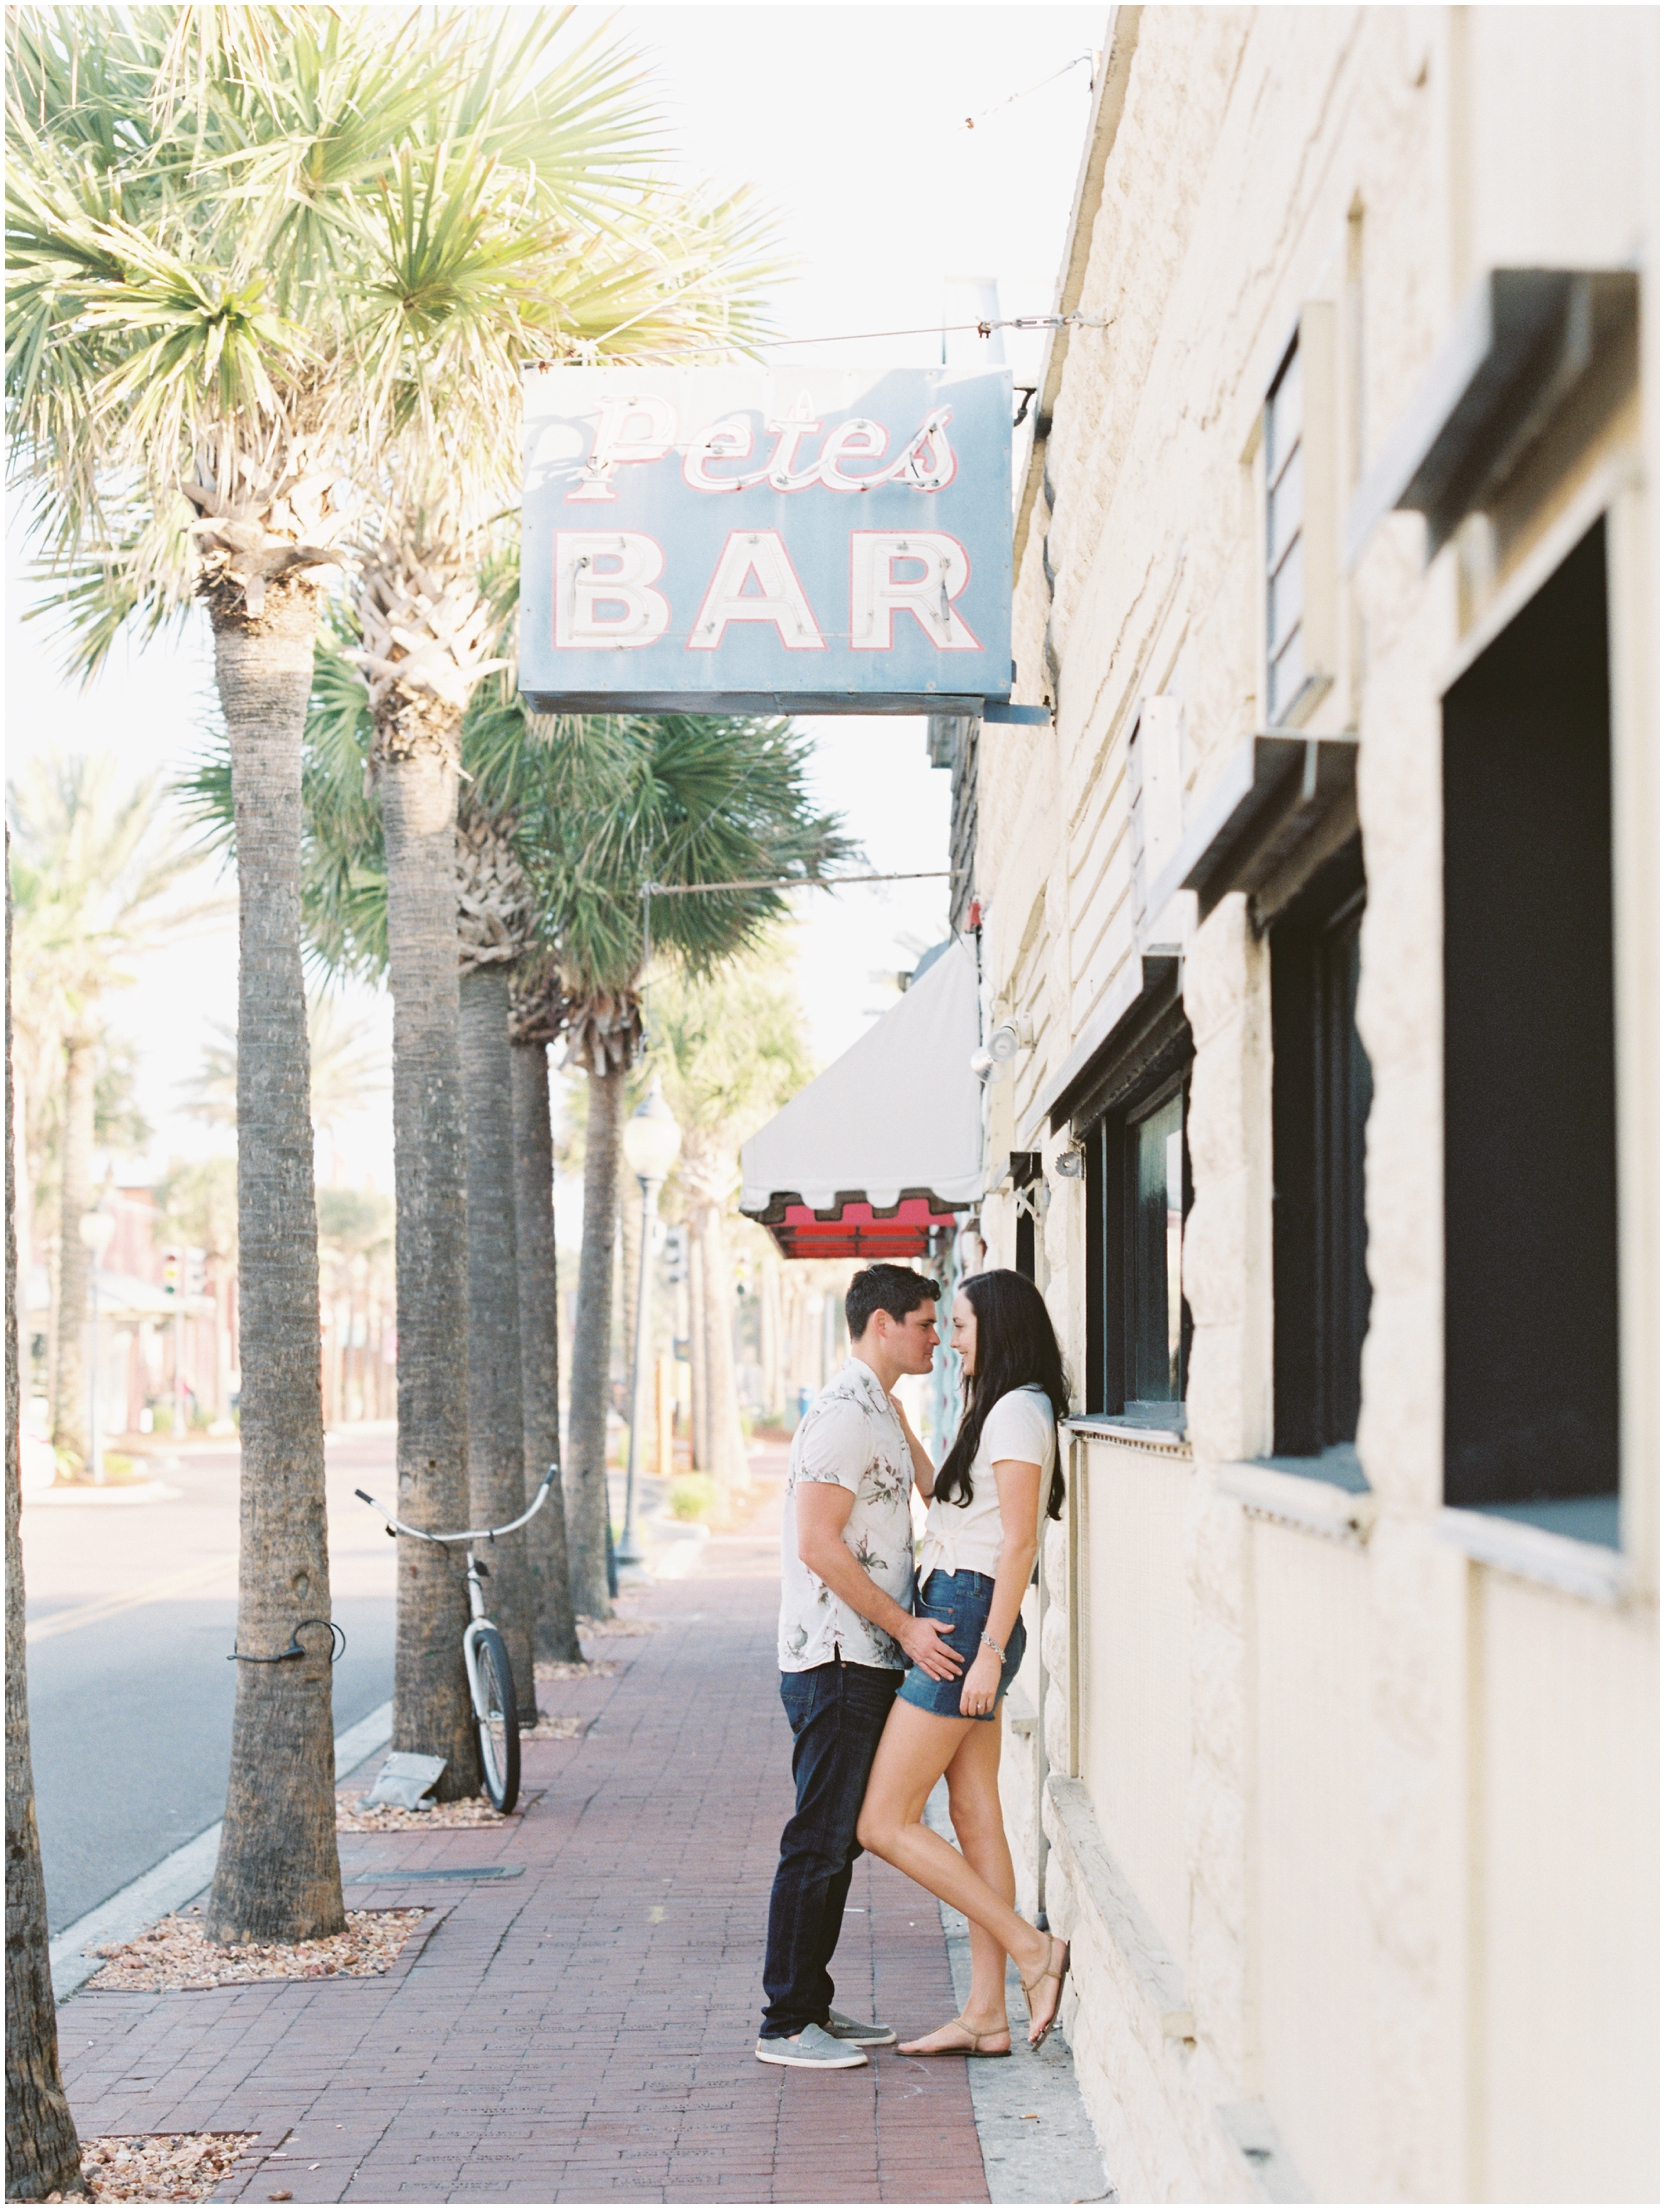 Lisa Silva Photography -Engagement Session at Neptune Beach, Florida- Jacksonville and North East Florida Fine Art Film Photographer_0022.jpg